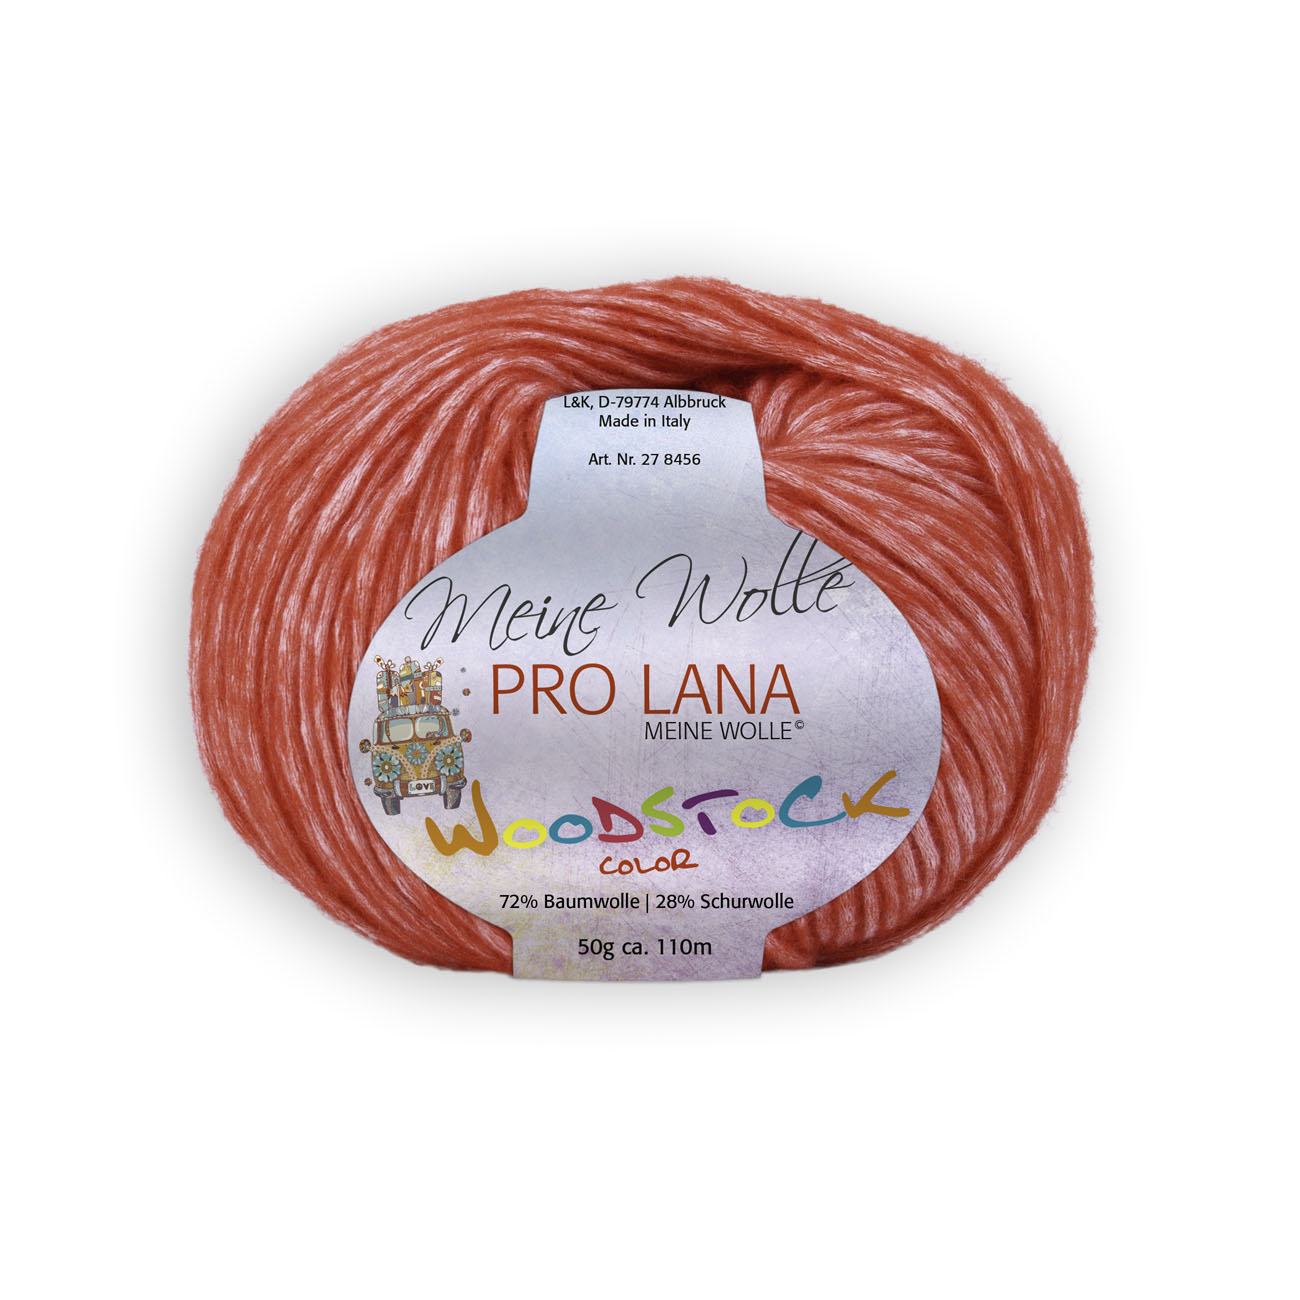 Pro Lana Woodstock 50g  0,5kg